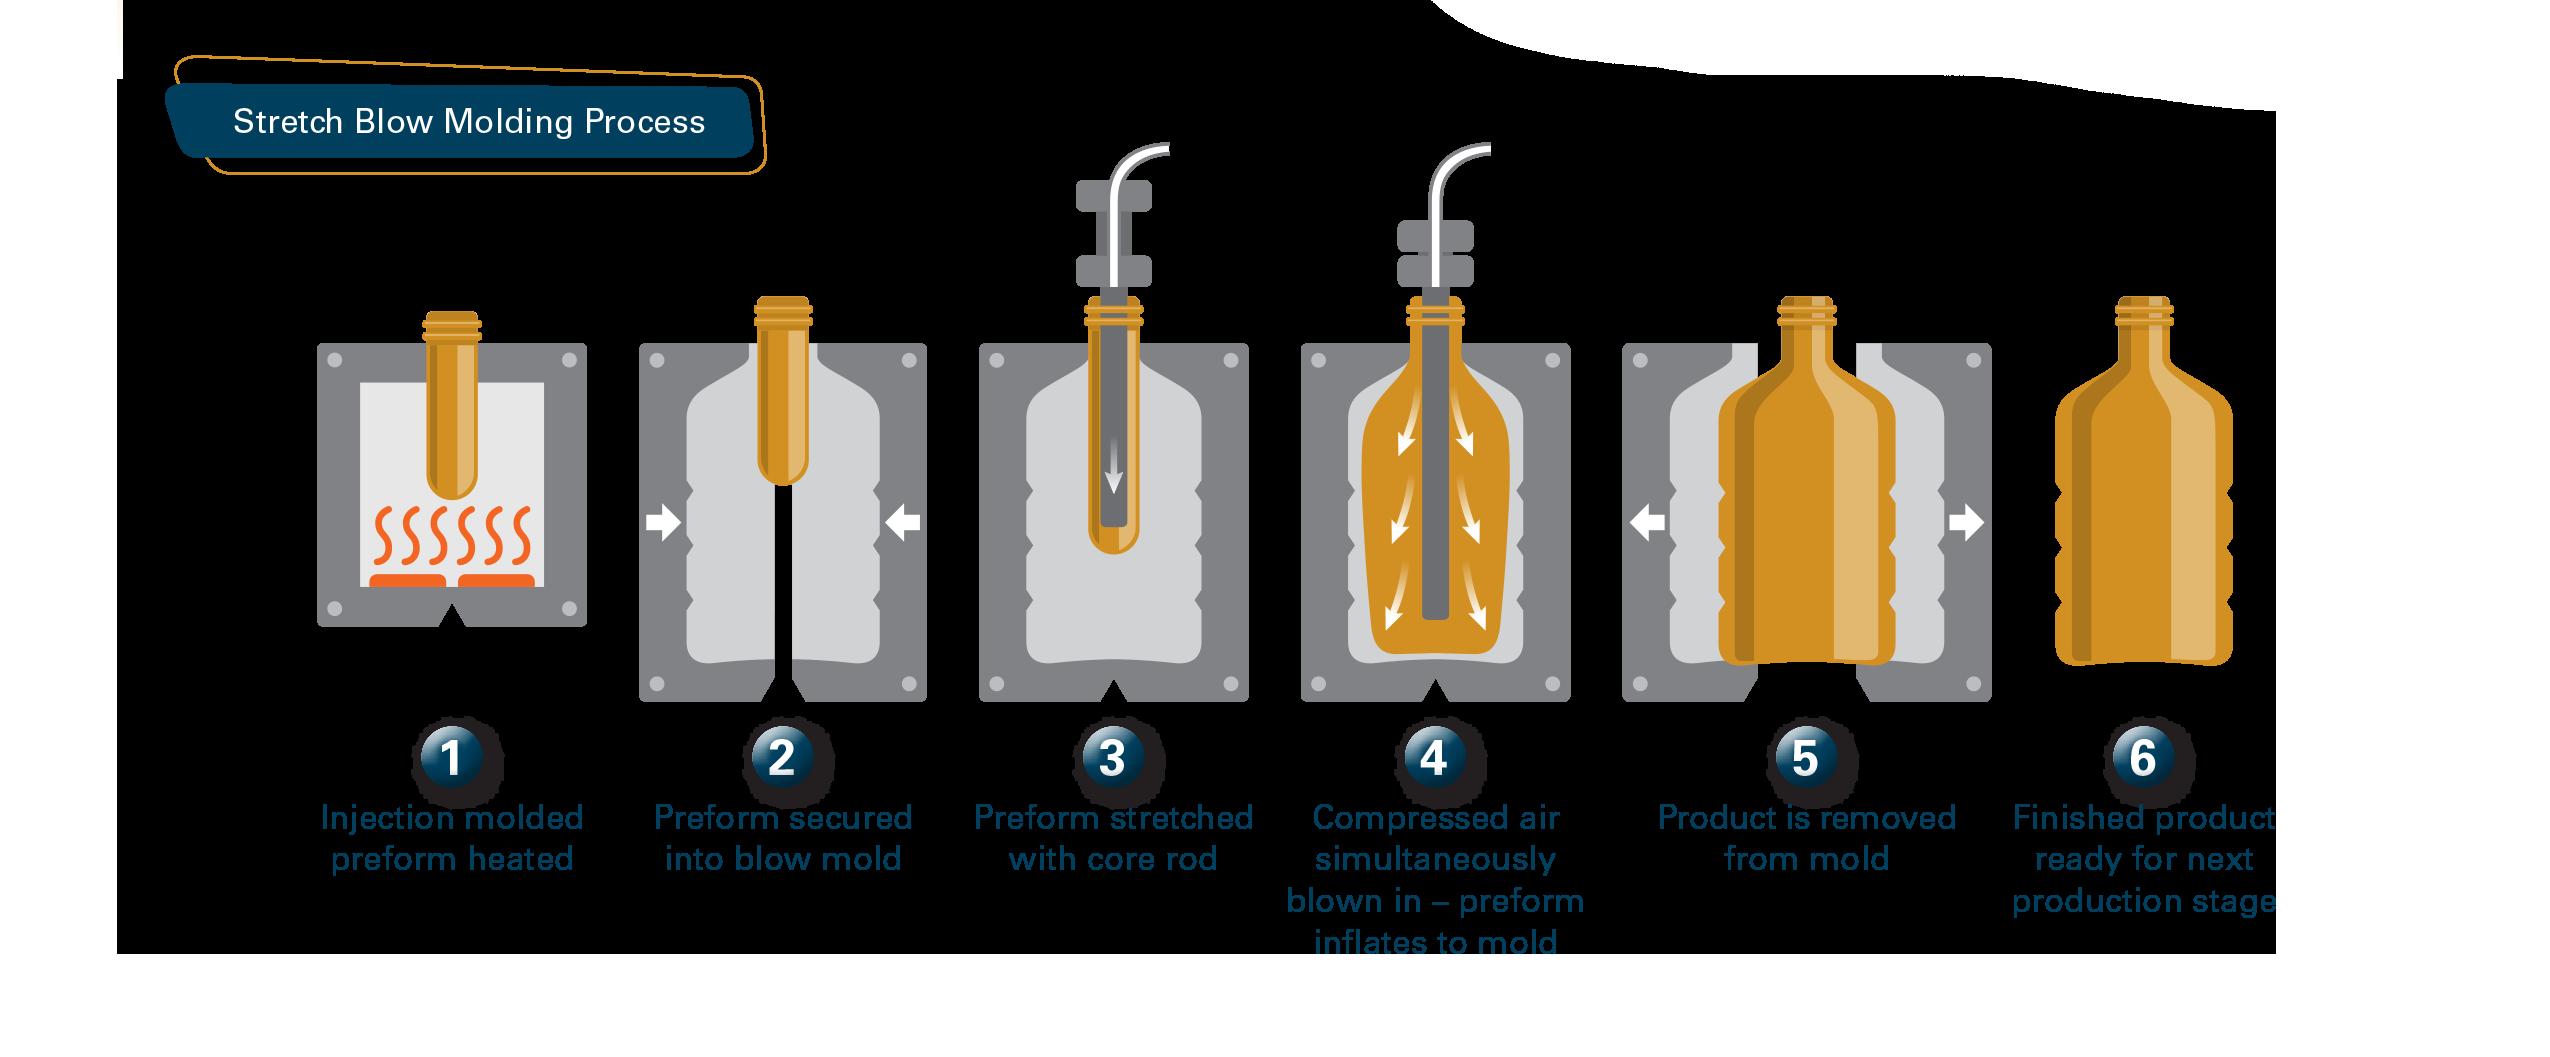 Stretch Blow Molding Process